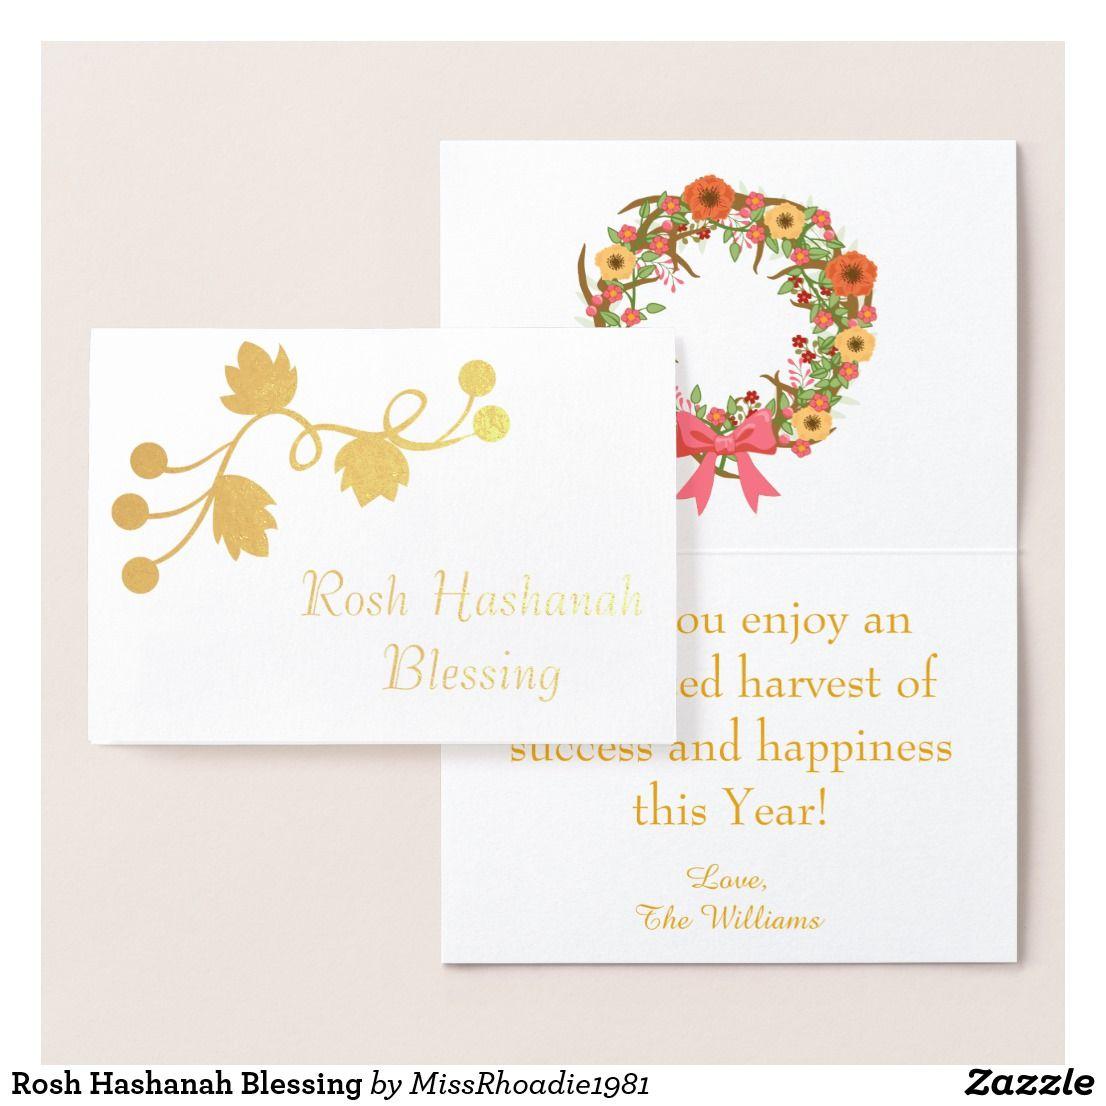 Rosh Hashanah Blessing Card This Gold Foil Card Contains A Rosh